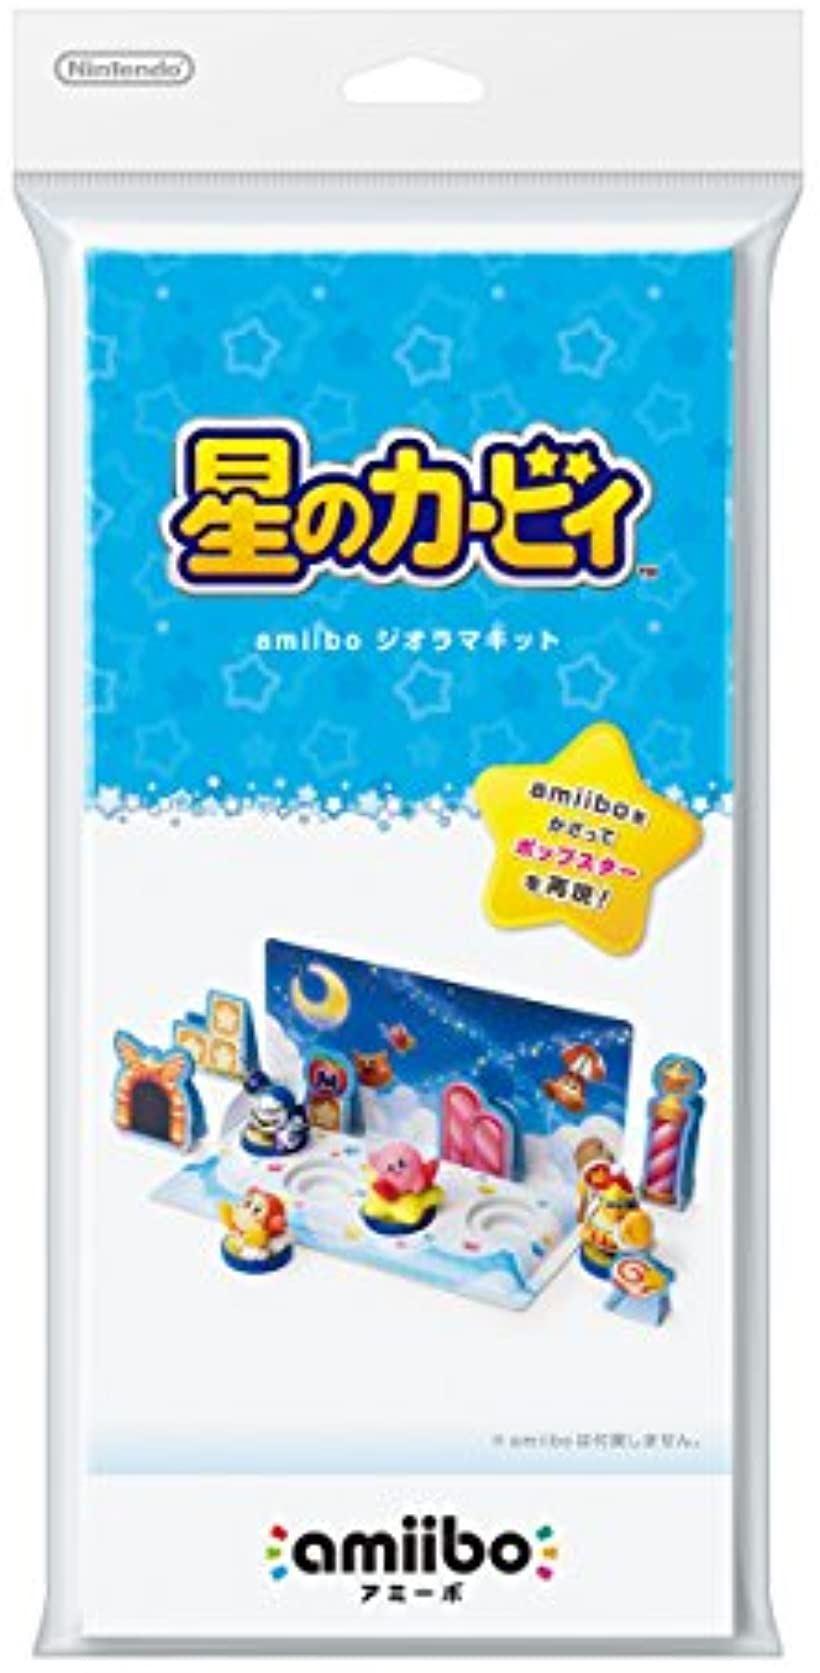 Nintendo 3DS・2DS, 周辺機器 amiibo (Nintendo 3DS)